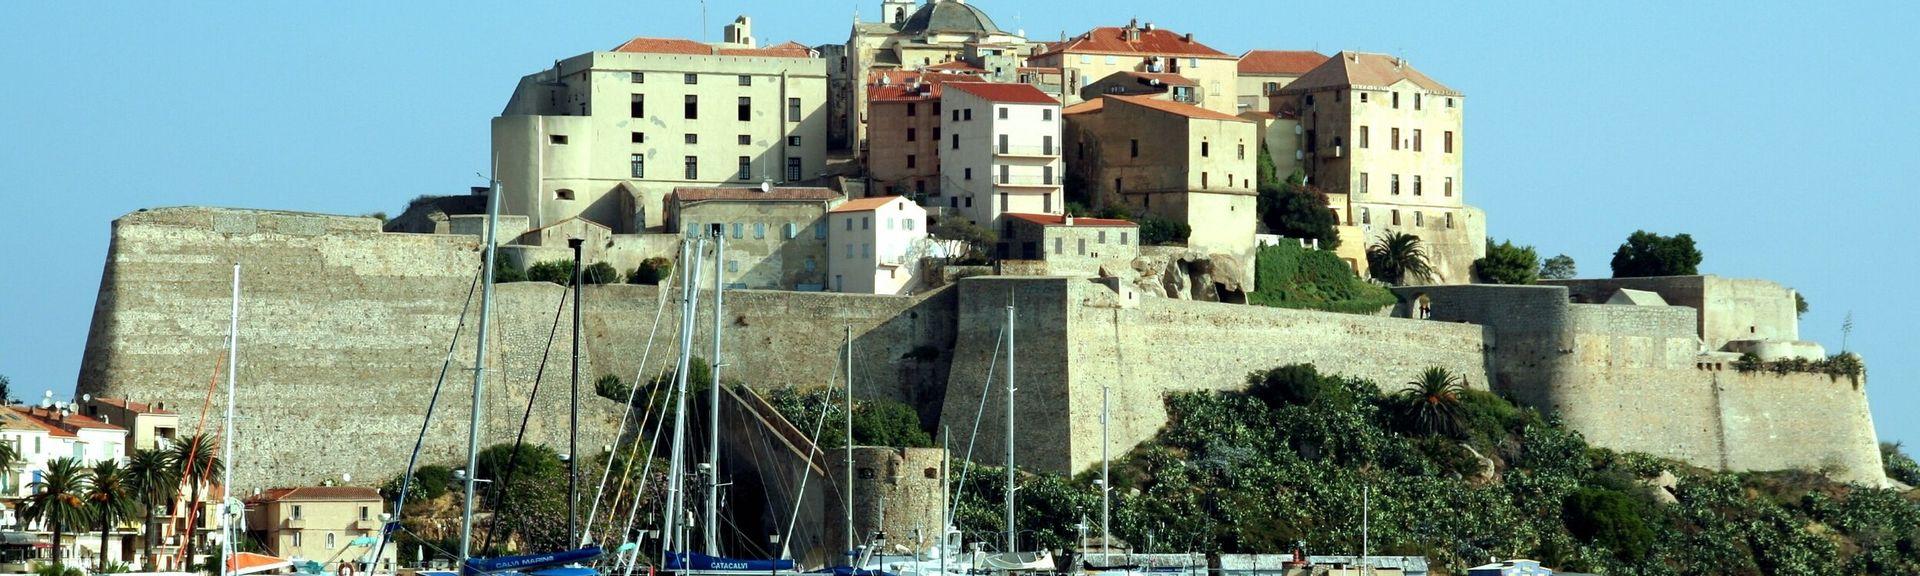 Citadelle de Calvi, Calvi, Korsika, Frankrike